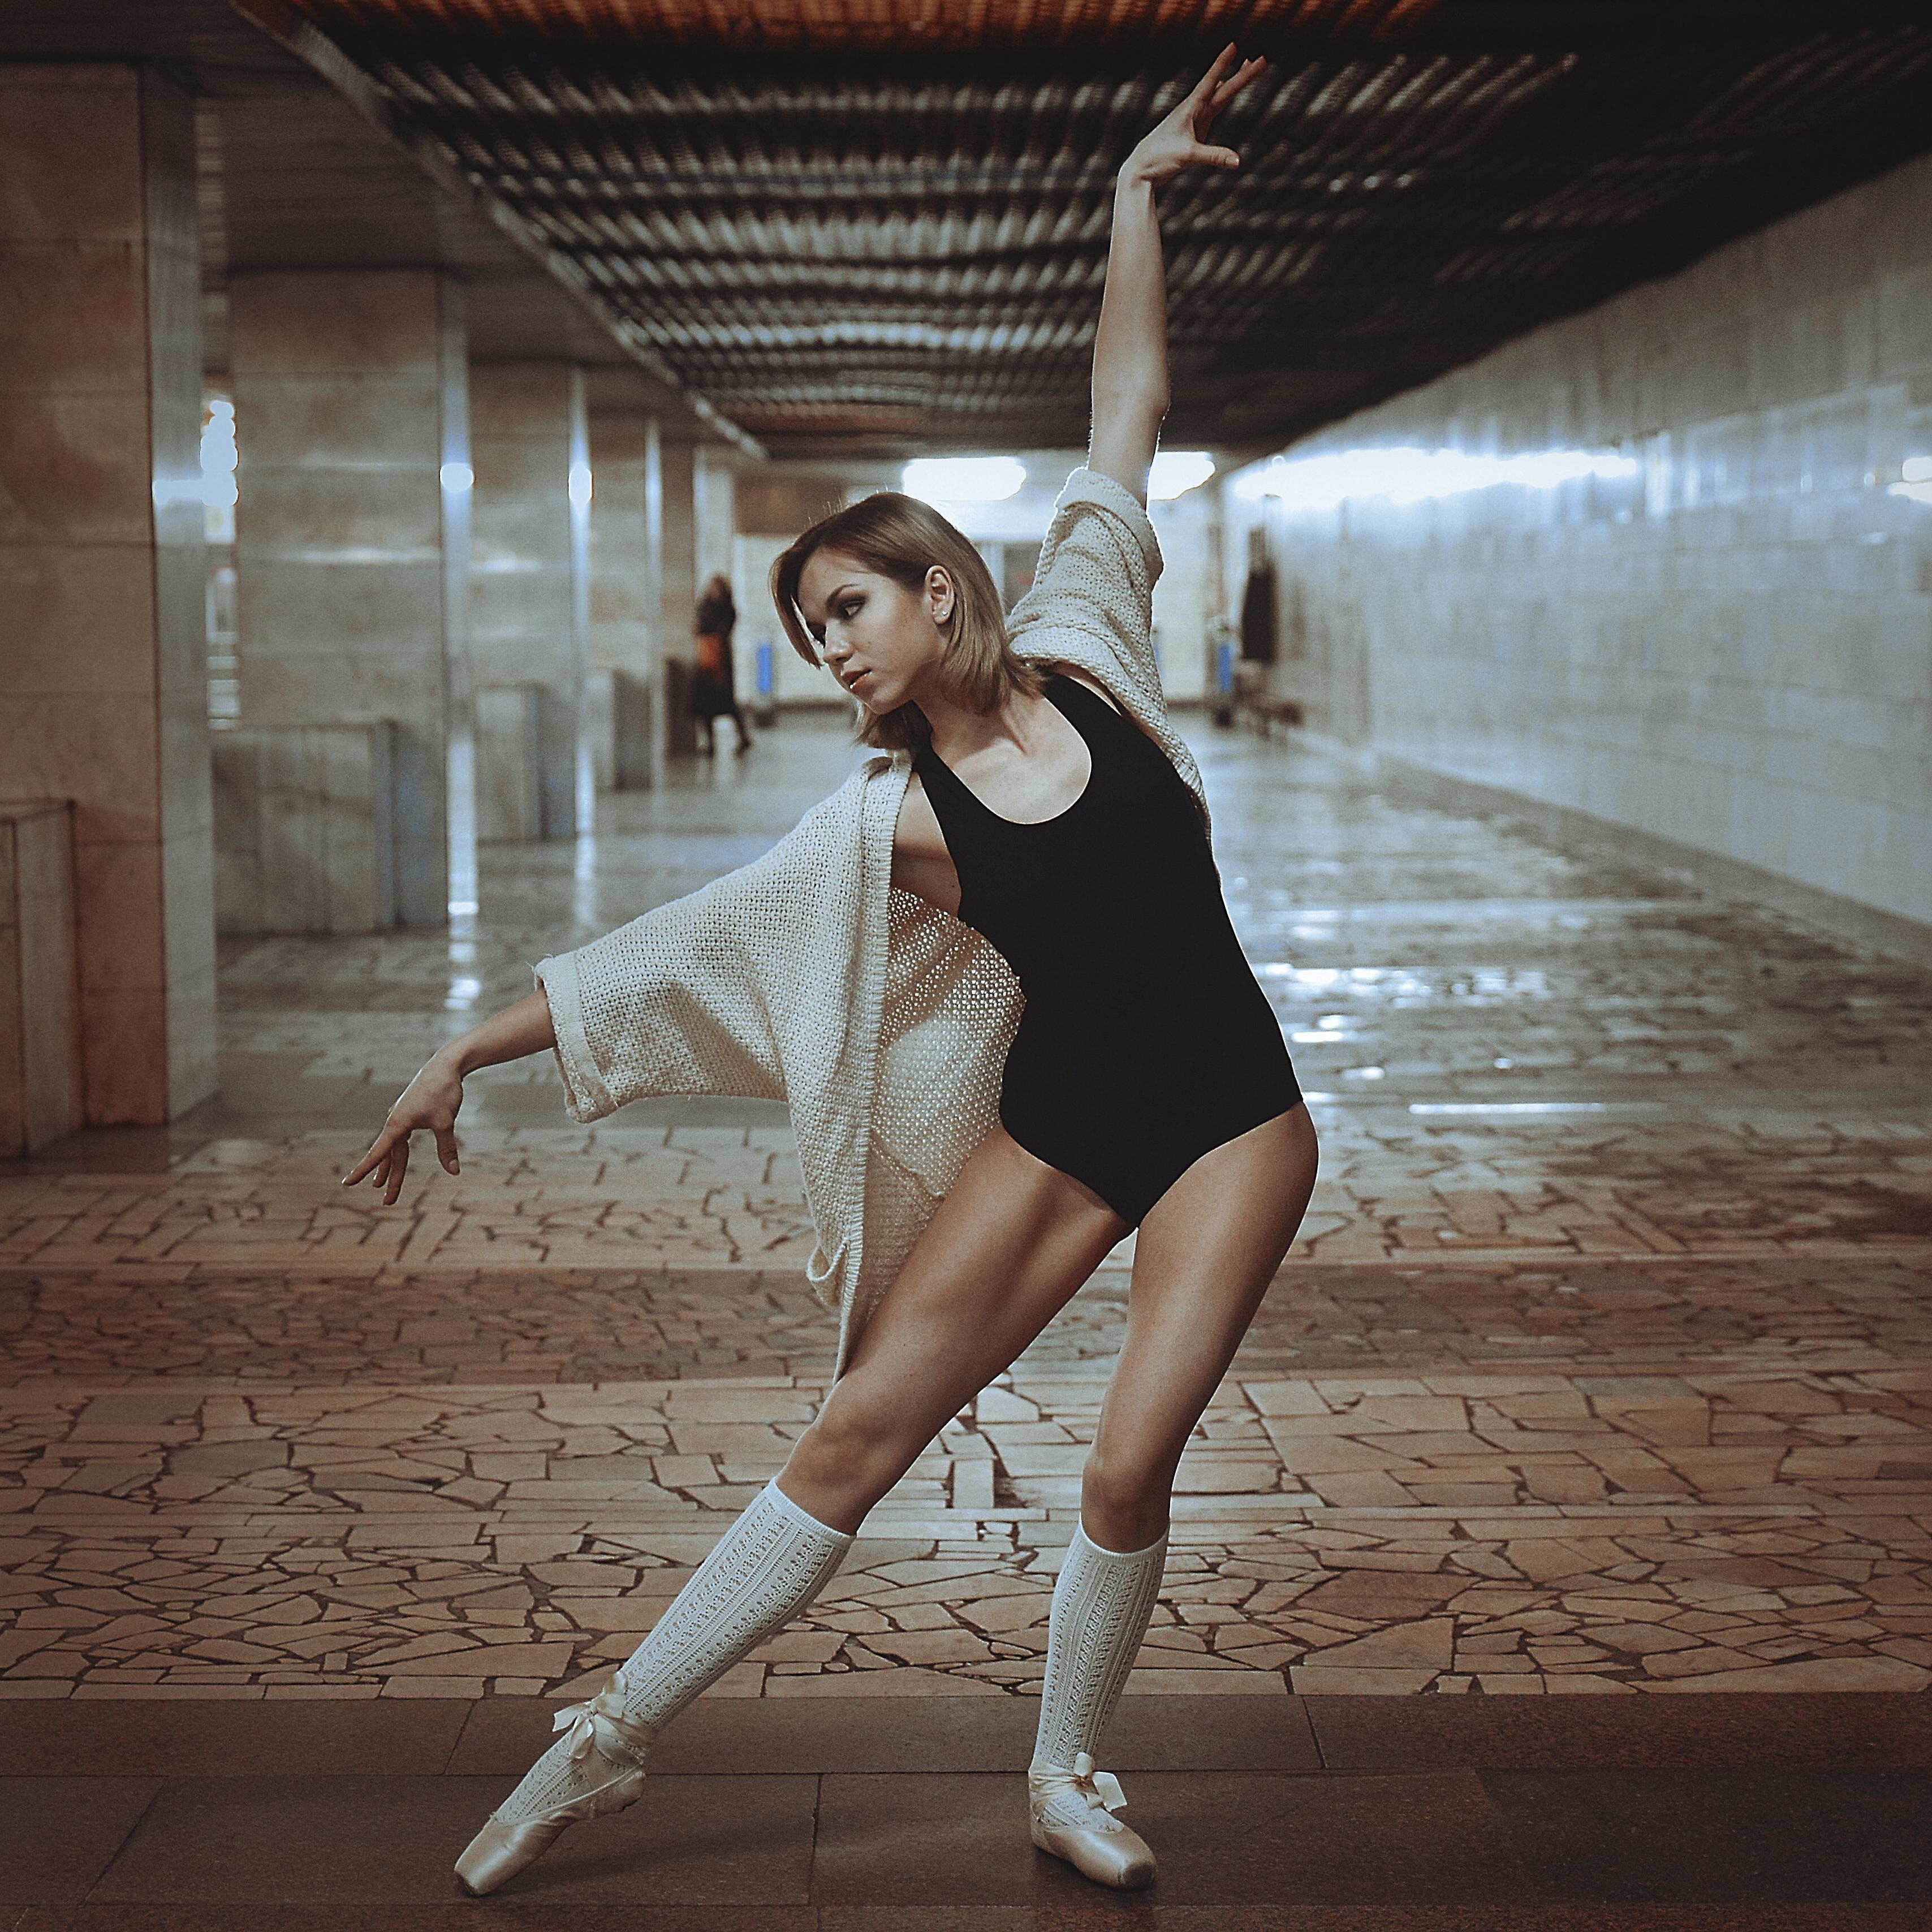 Woman Doing Ballet Pose Free Stock Photo